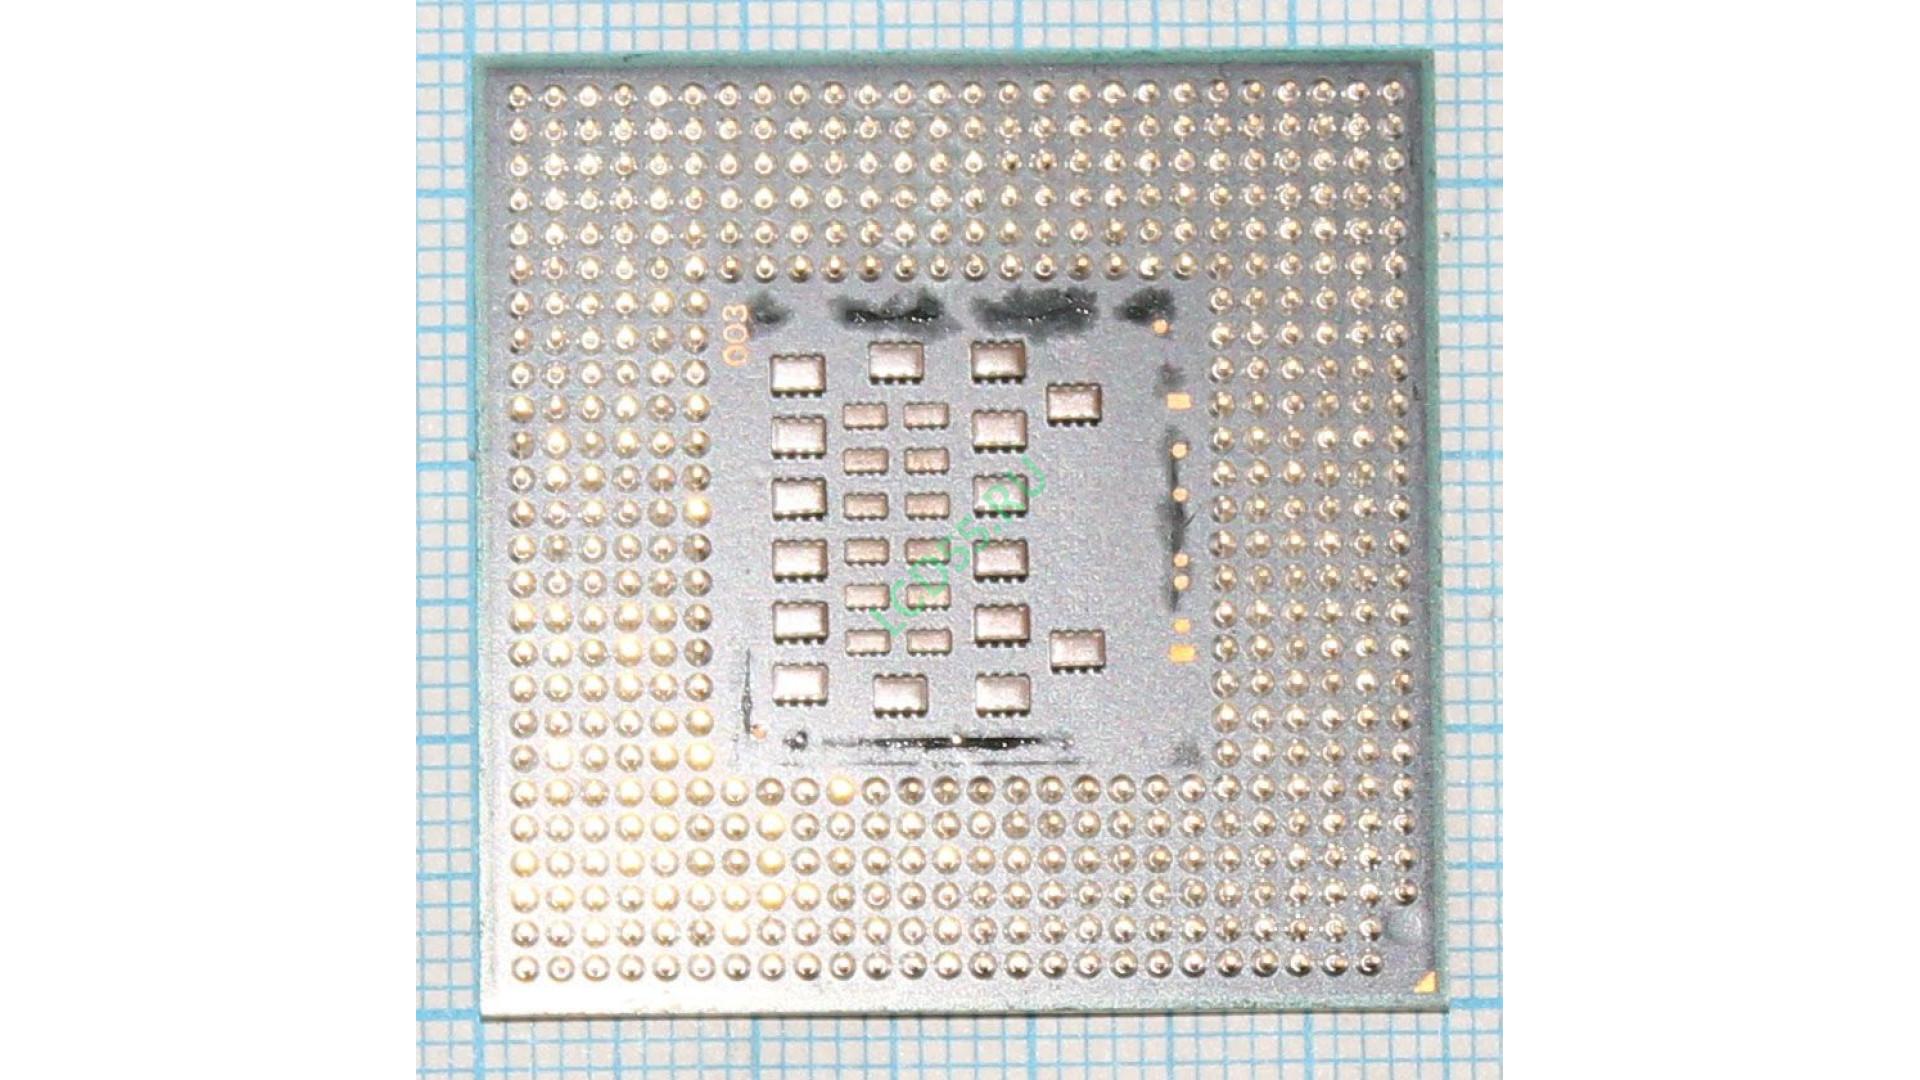 Intel T2250 SL9DV